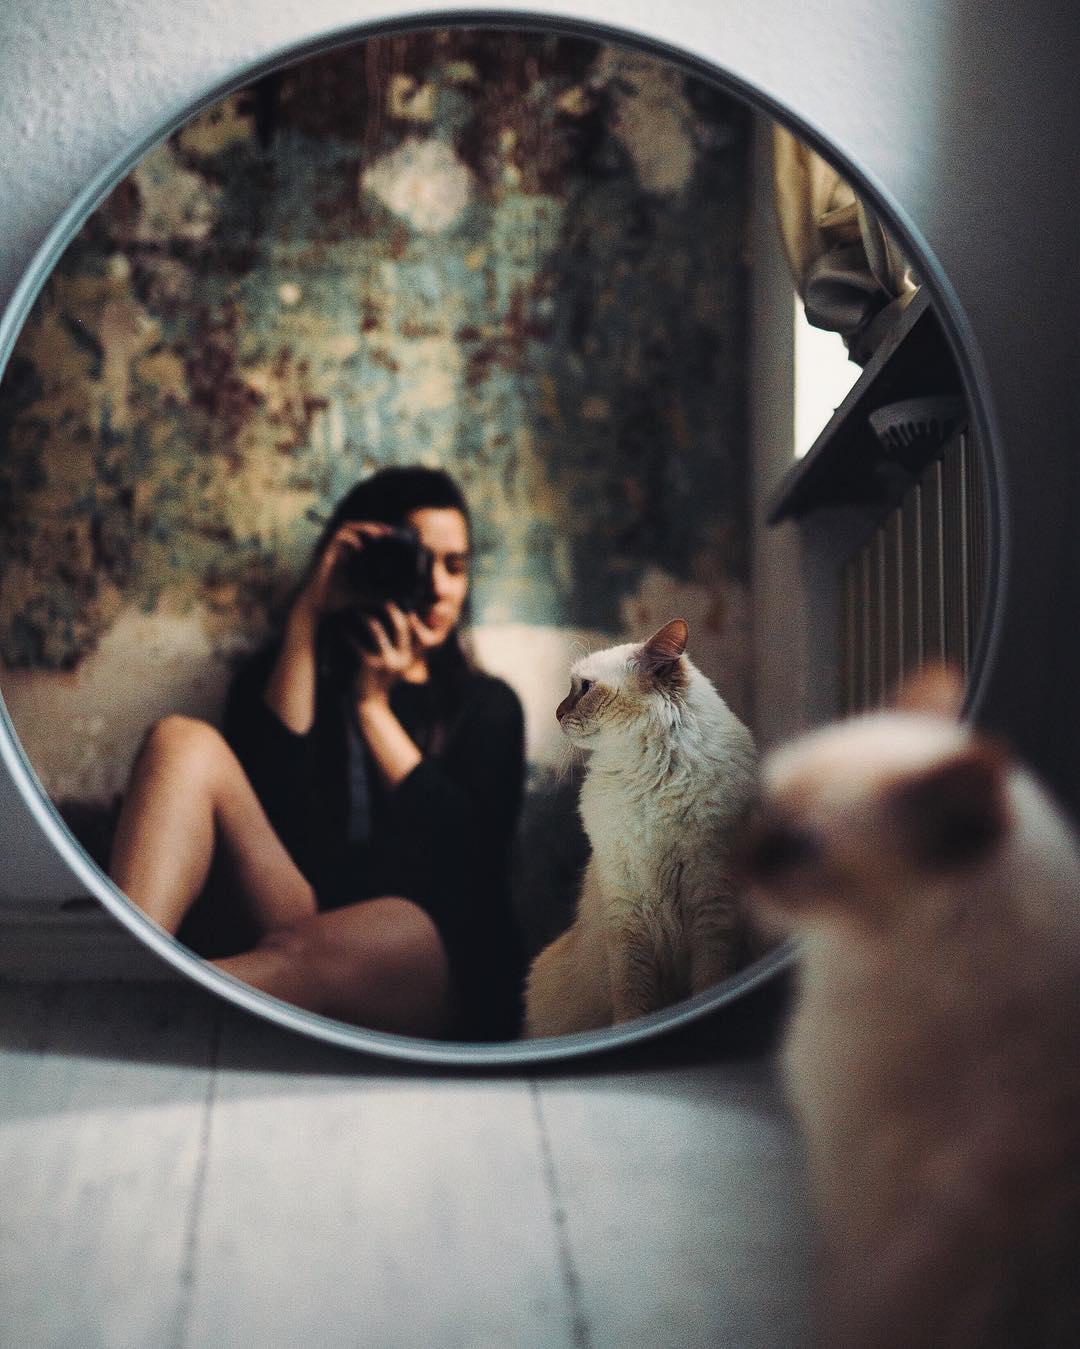 Marvelous 35mm Film Portraits by Ezgi Polat